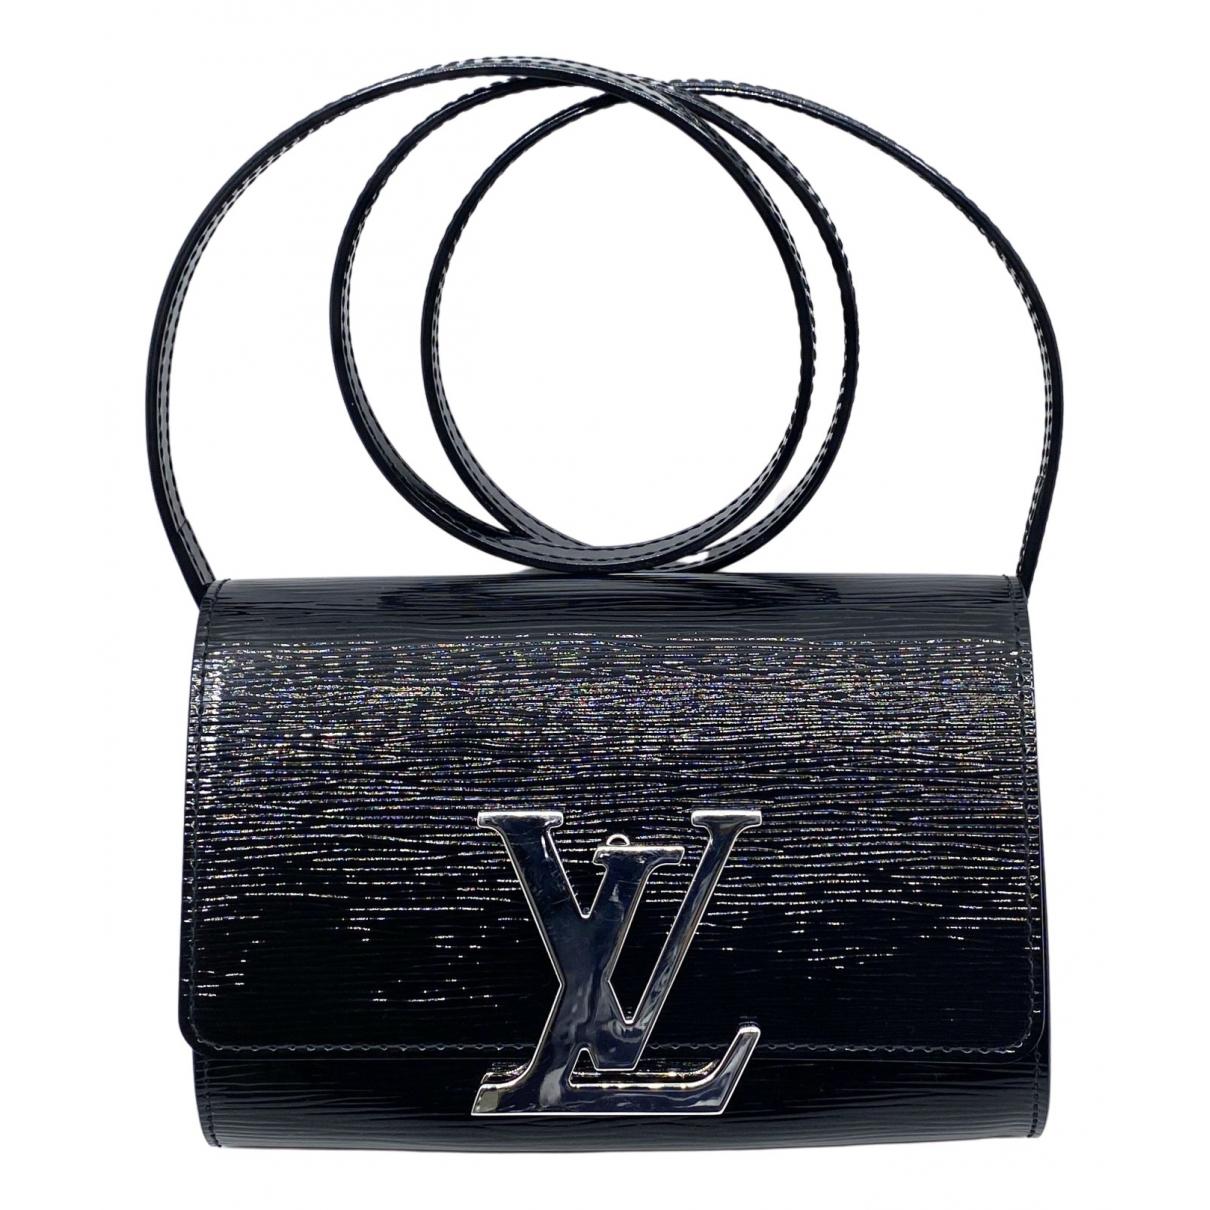 Louis Vuitton Louise Black Patent leather Clutch bag for Women \N